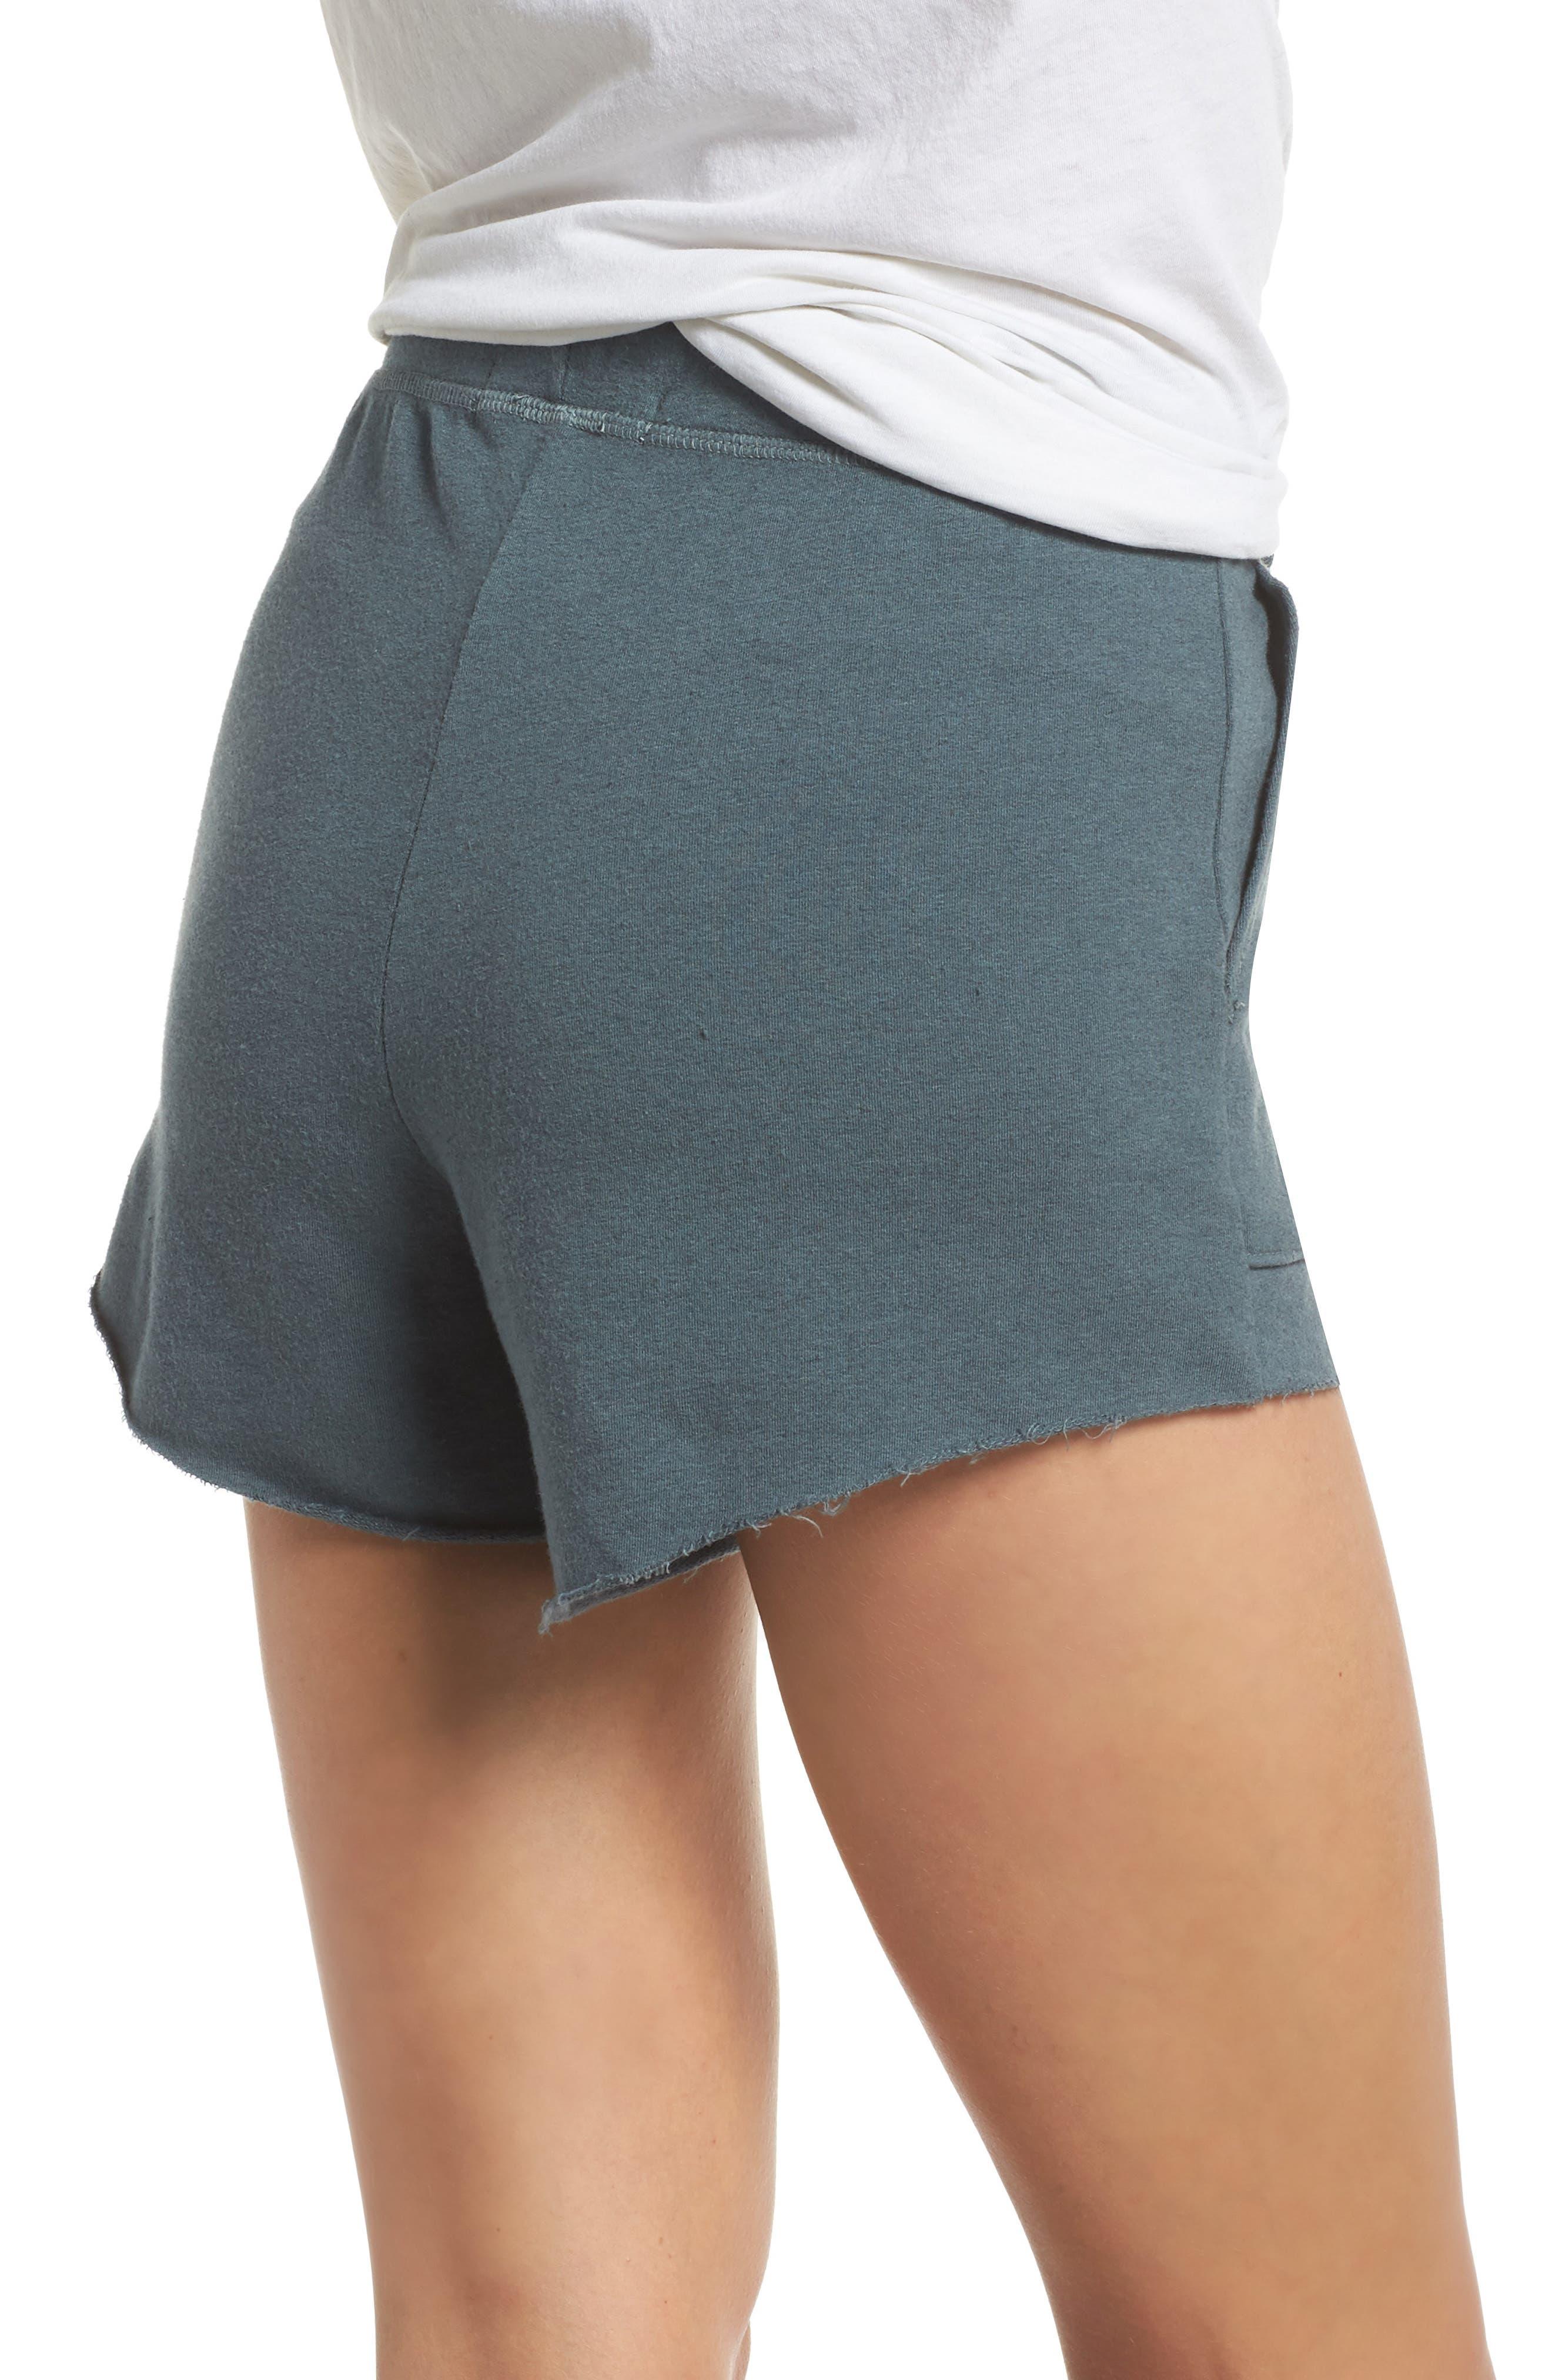 Raw Cut Lounge Shorts,                             Alternate thumbnail 2, color,                             Gunmetal